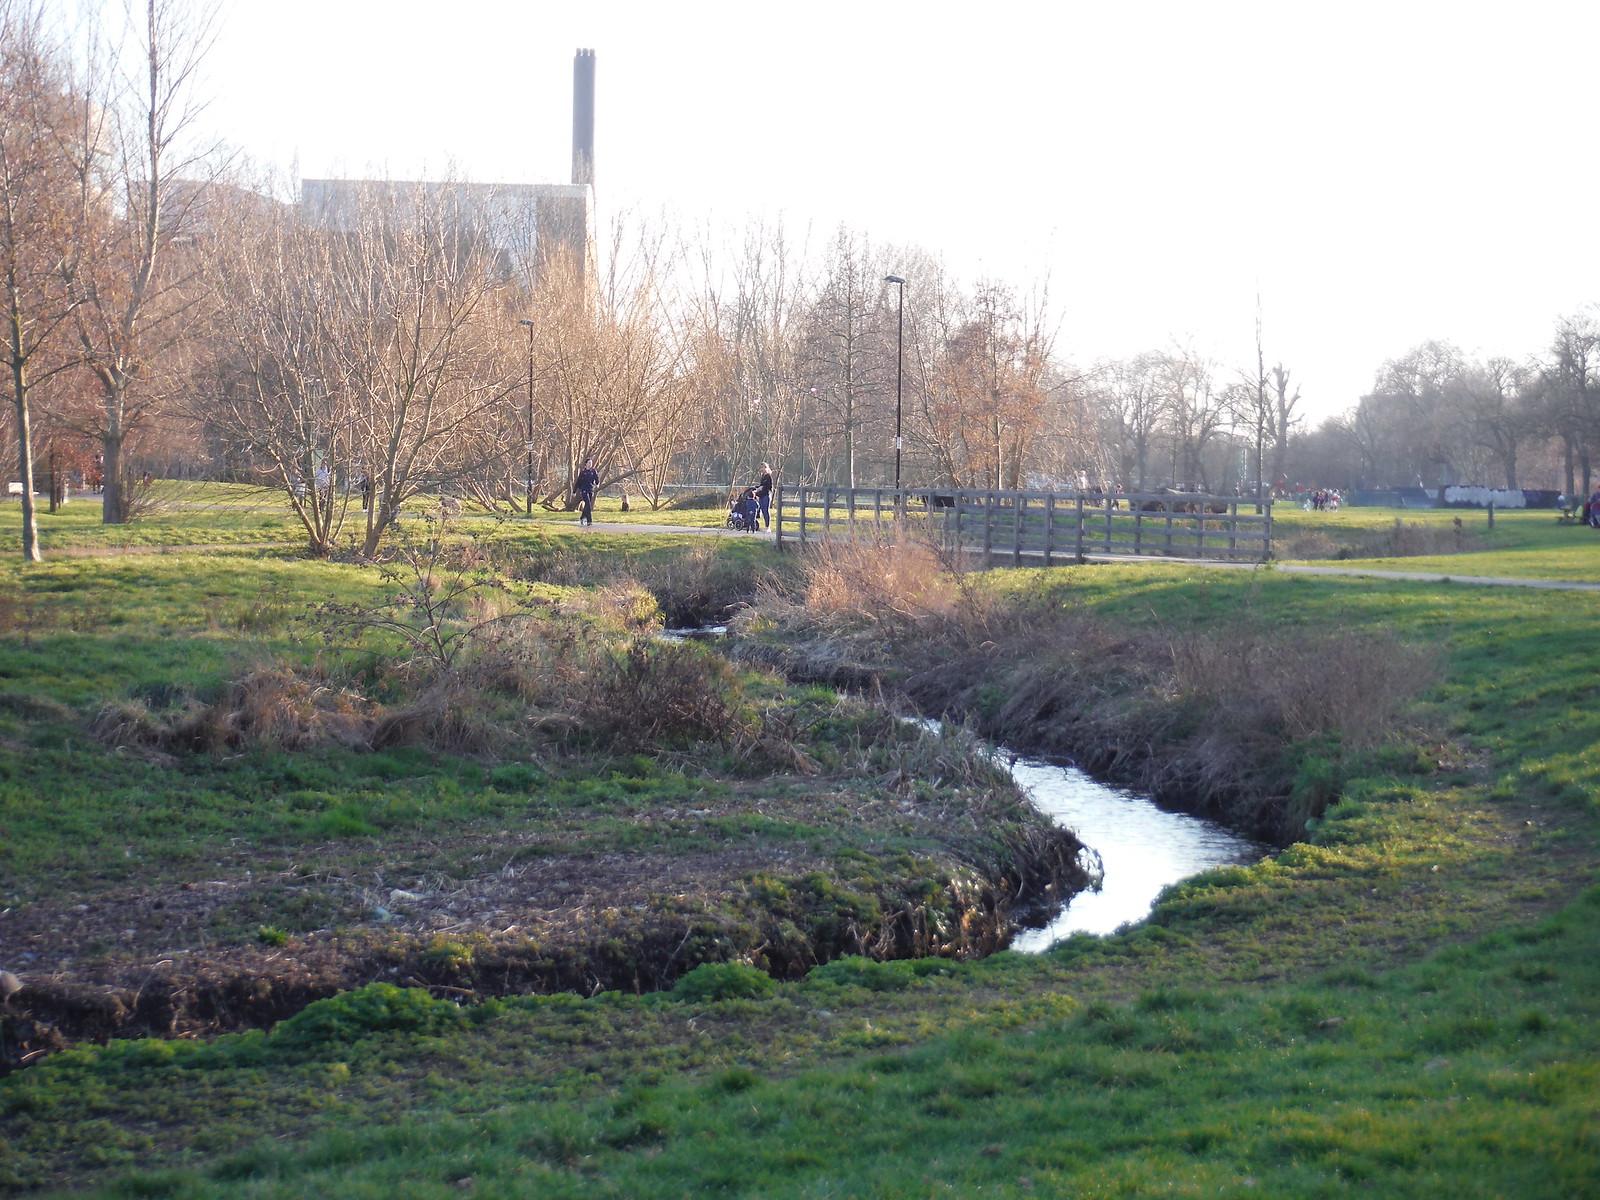 Restored Channel of the Ravensbourne, Ladywell Fields SWC Short Walk 36 - Waterlink Way (Lower Sydenham to Greenwich)